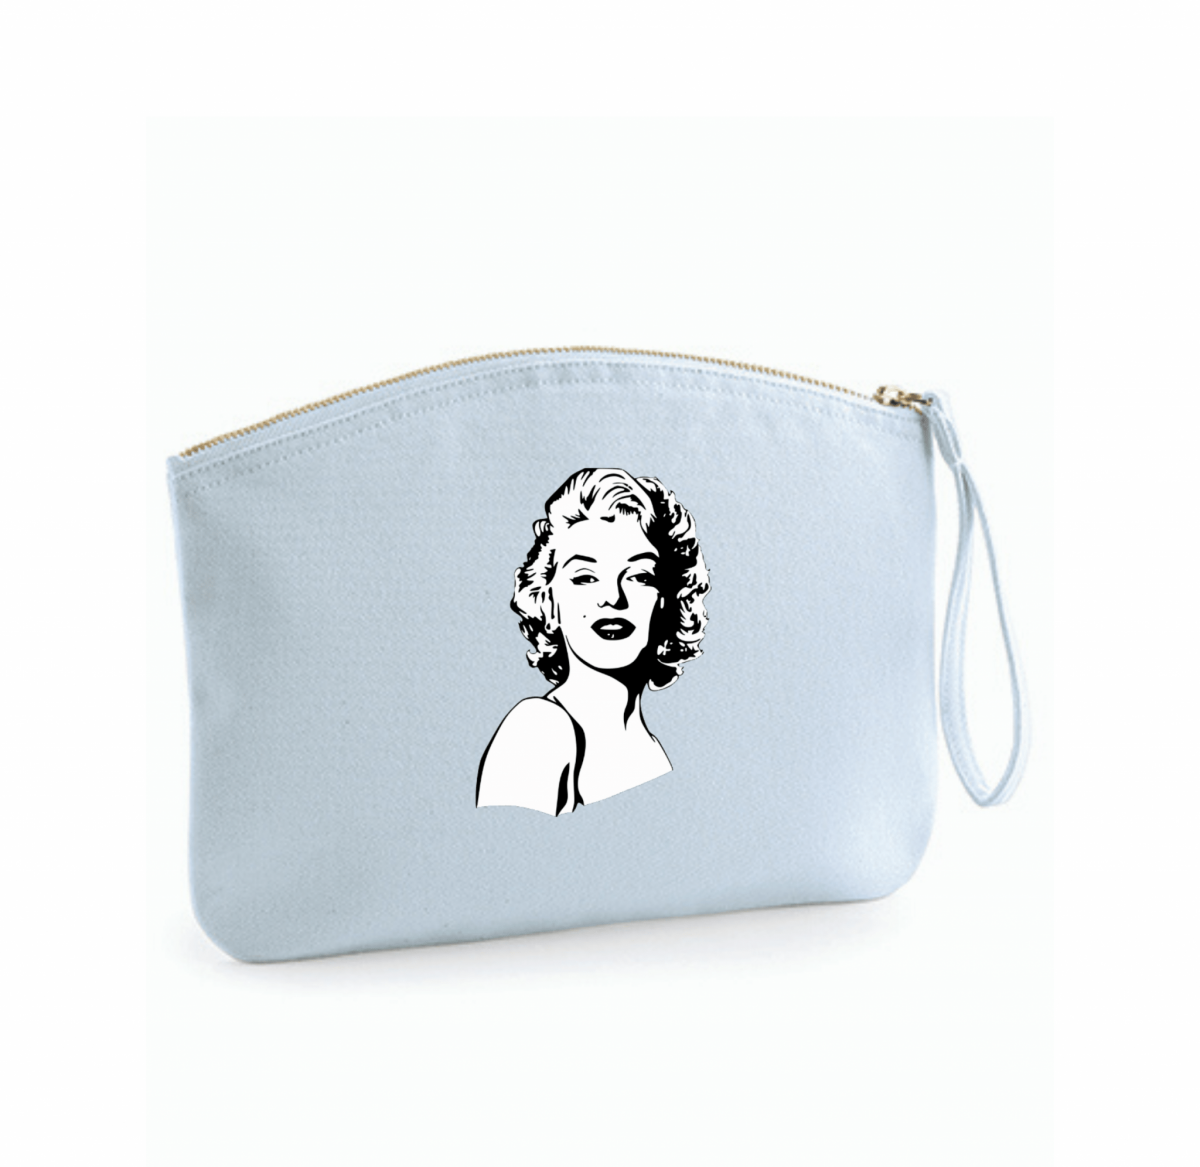 Trousse de toilette - Portrait de Marilyn Monroe